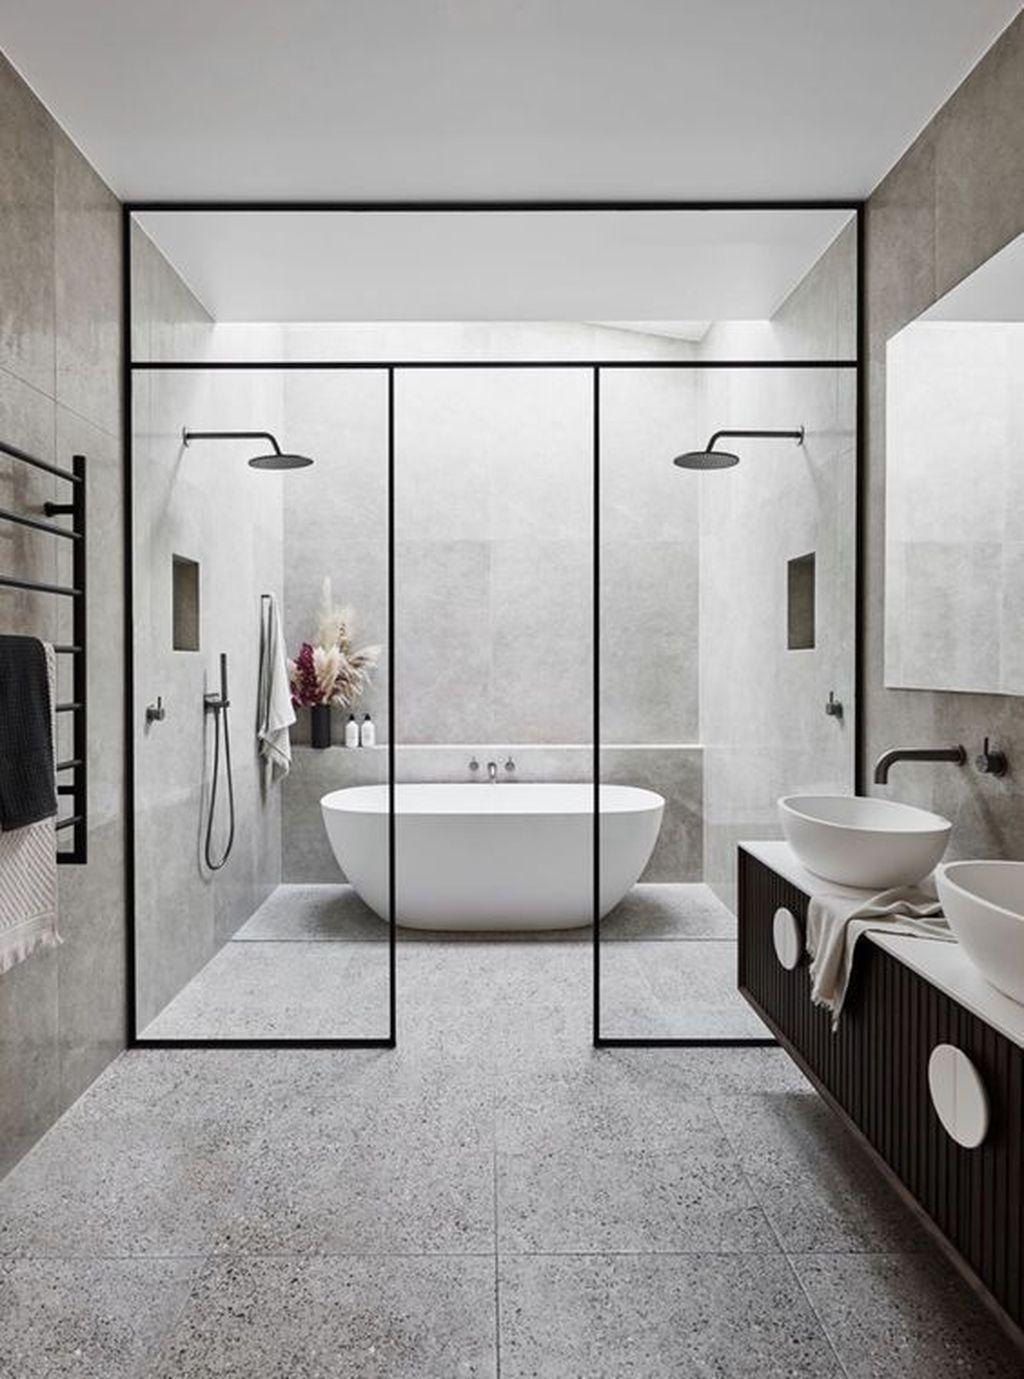 Unusual Bathroom Design Ideas You Need To Know 05